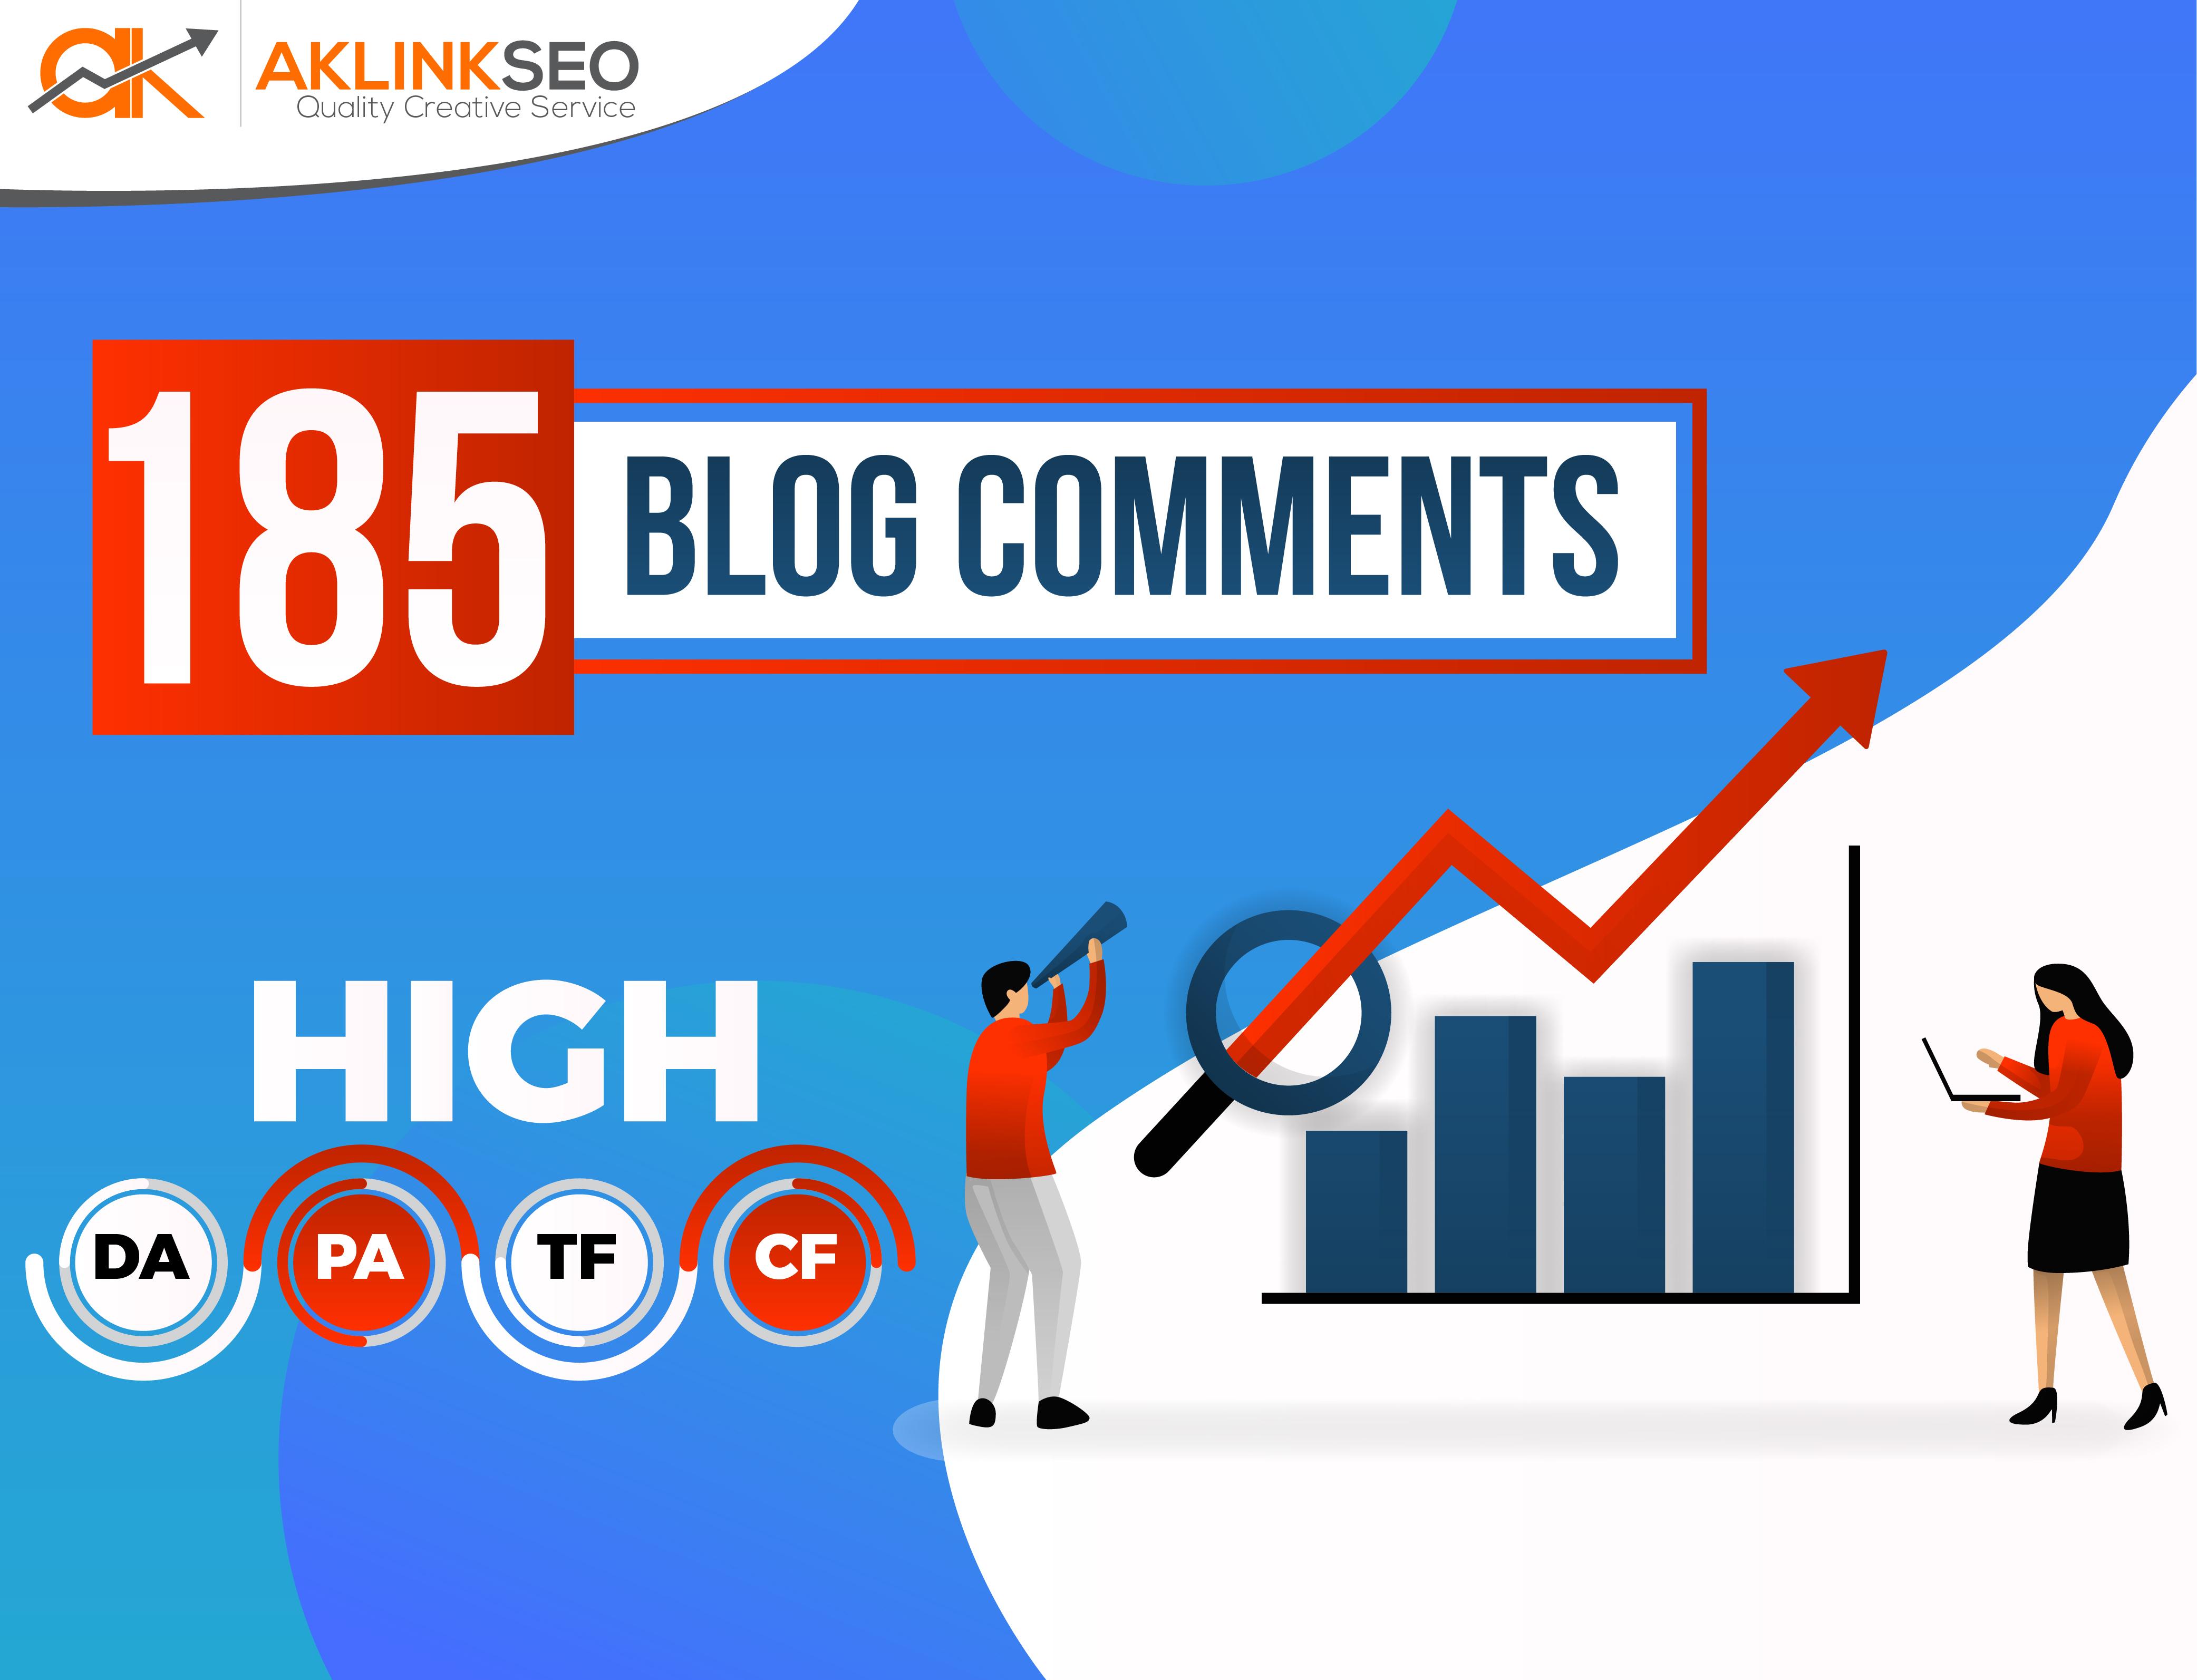 Provide 185 High Quality DA/PA/TF/CF Unique Domain Manually Do-Follow Blog Comments Backlinks